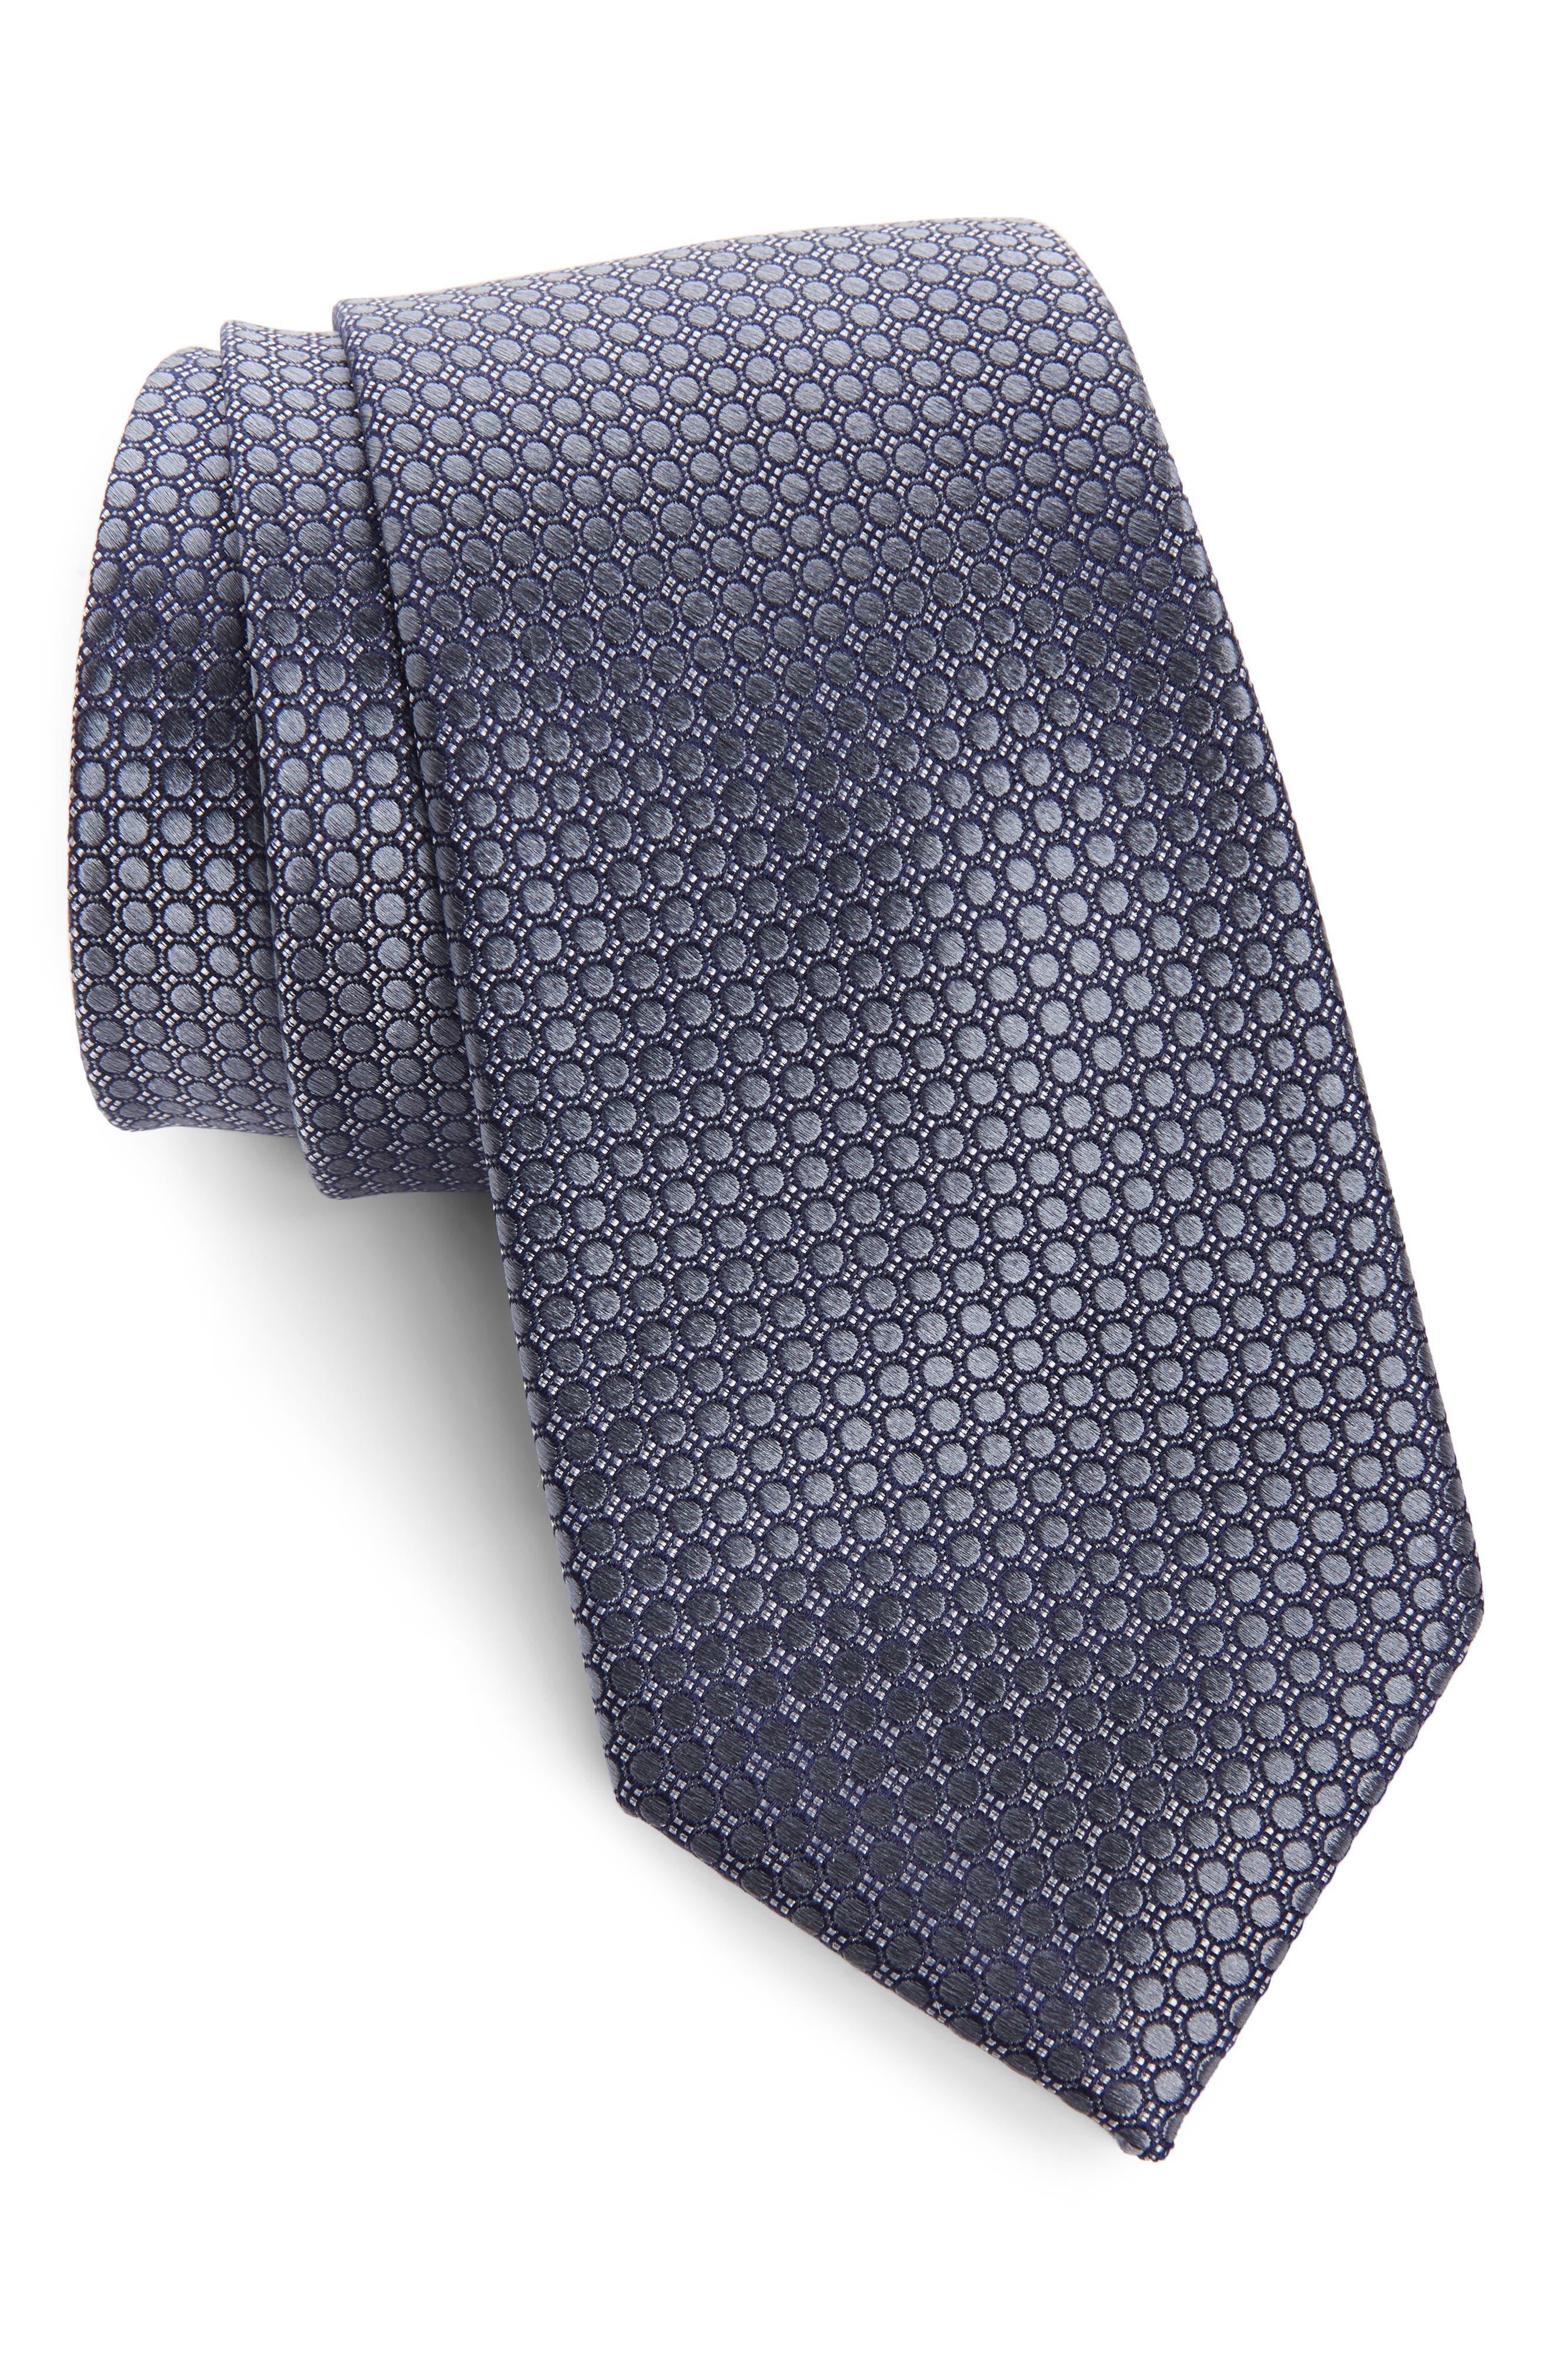 NORDSTROM MEN'S SHOP Alana Geometric Silk Tie, Main, color, BLACK/ GREY